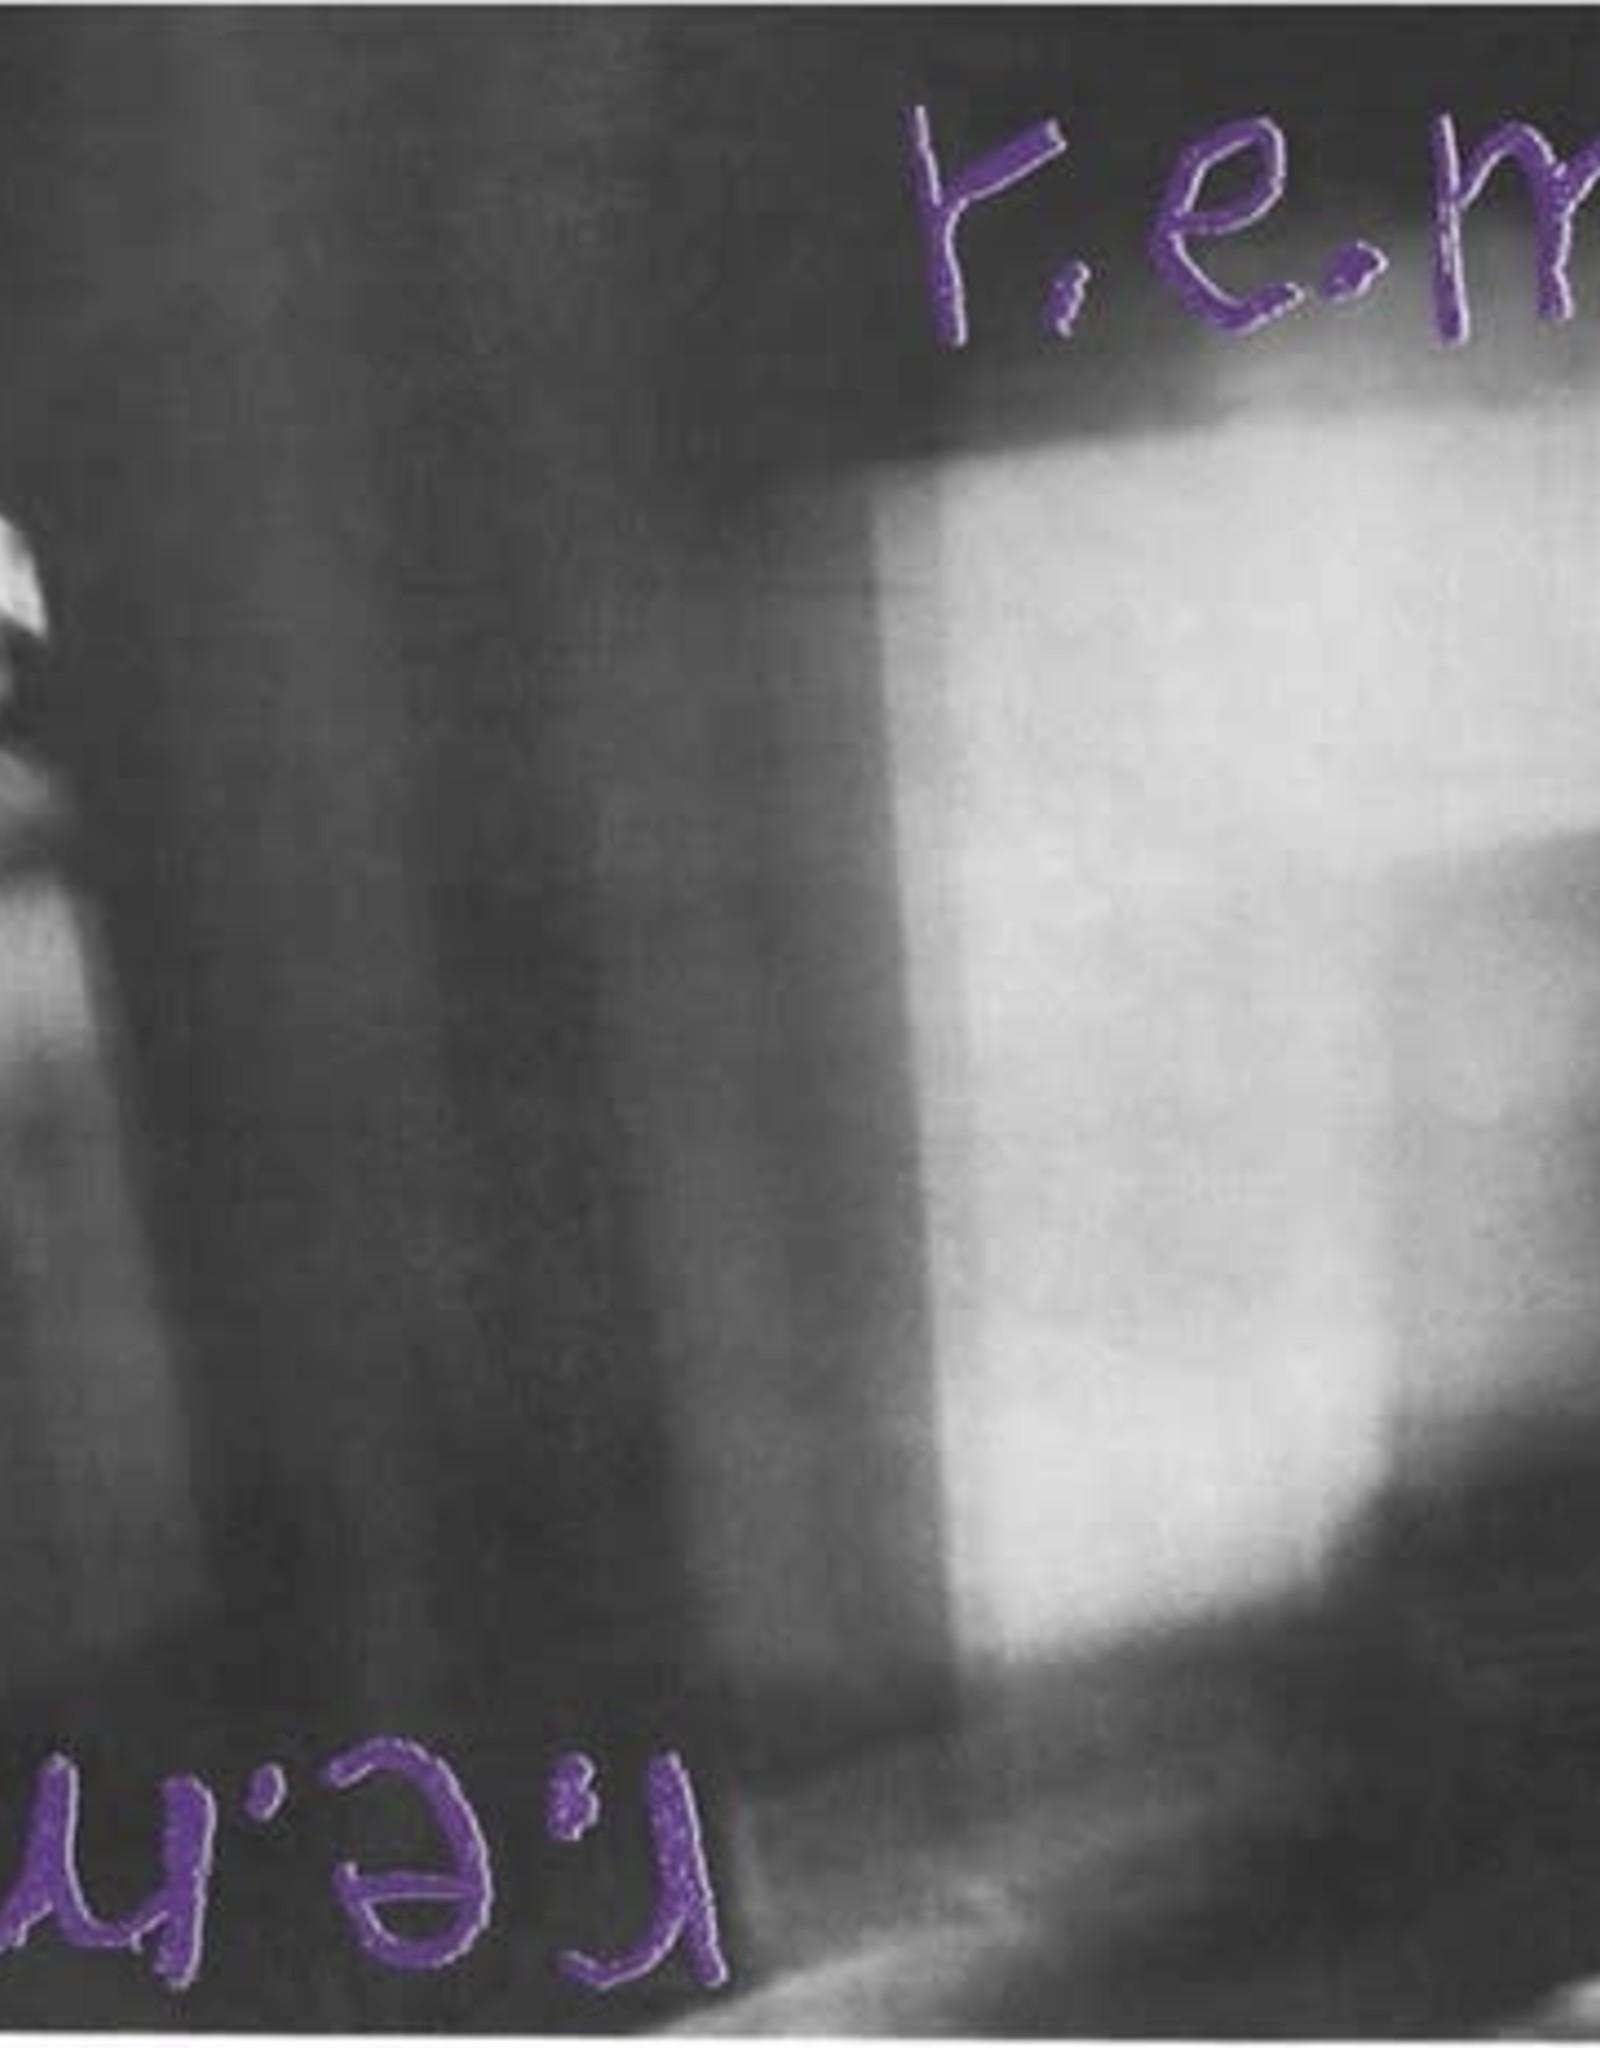 "R.E.M. - Radio Free Europe (Original Hib-Tone Recording) / Sitting Still (Limited Edition 7"")"